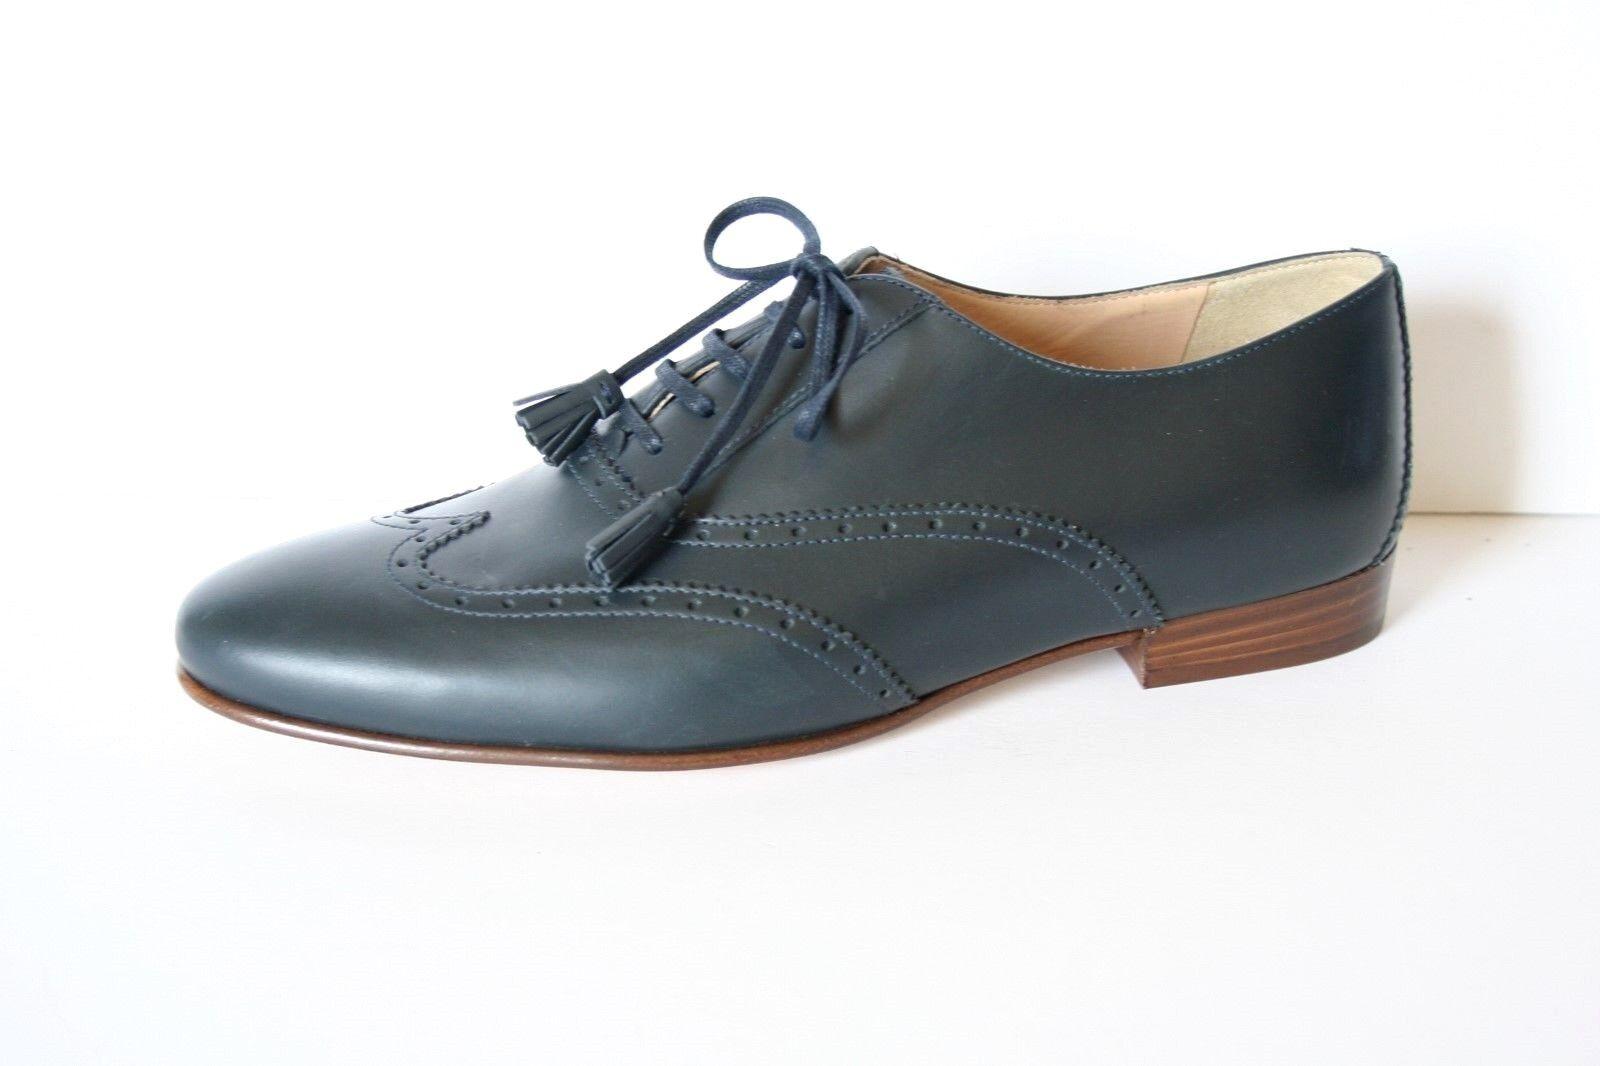 JCrew Tasseled Oxford Shoes 10.5 Navy Flats E1161 $268 Tassel